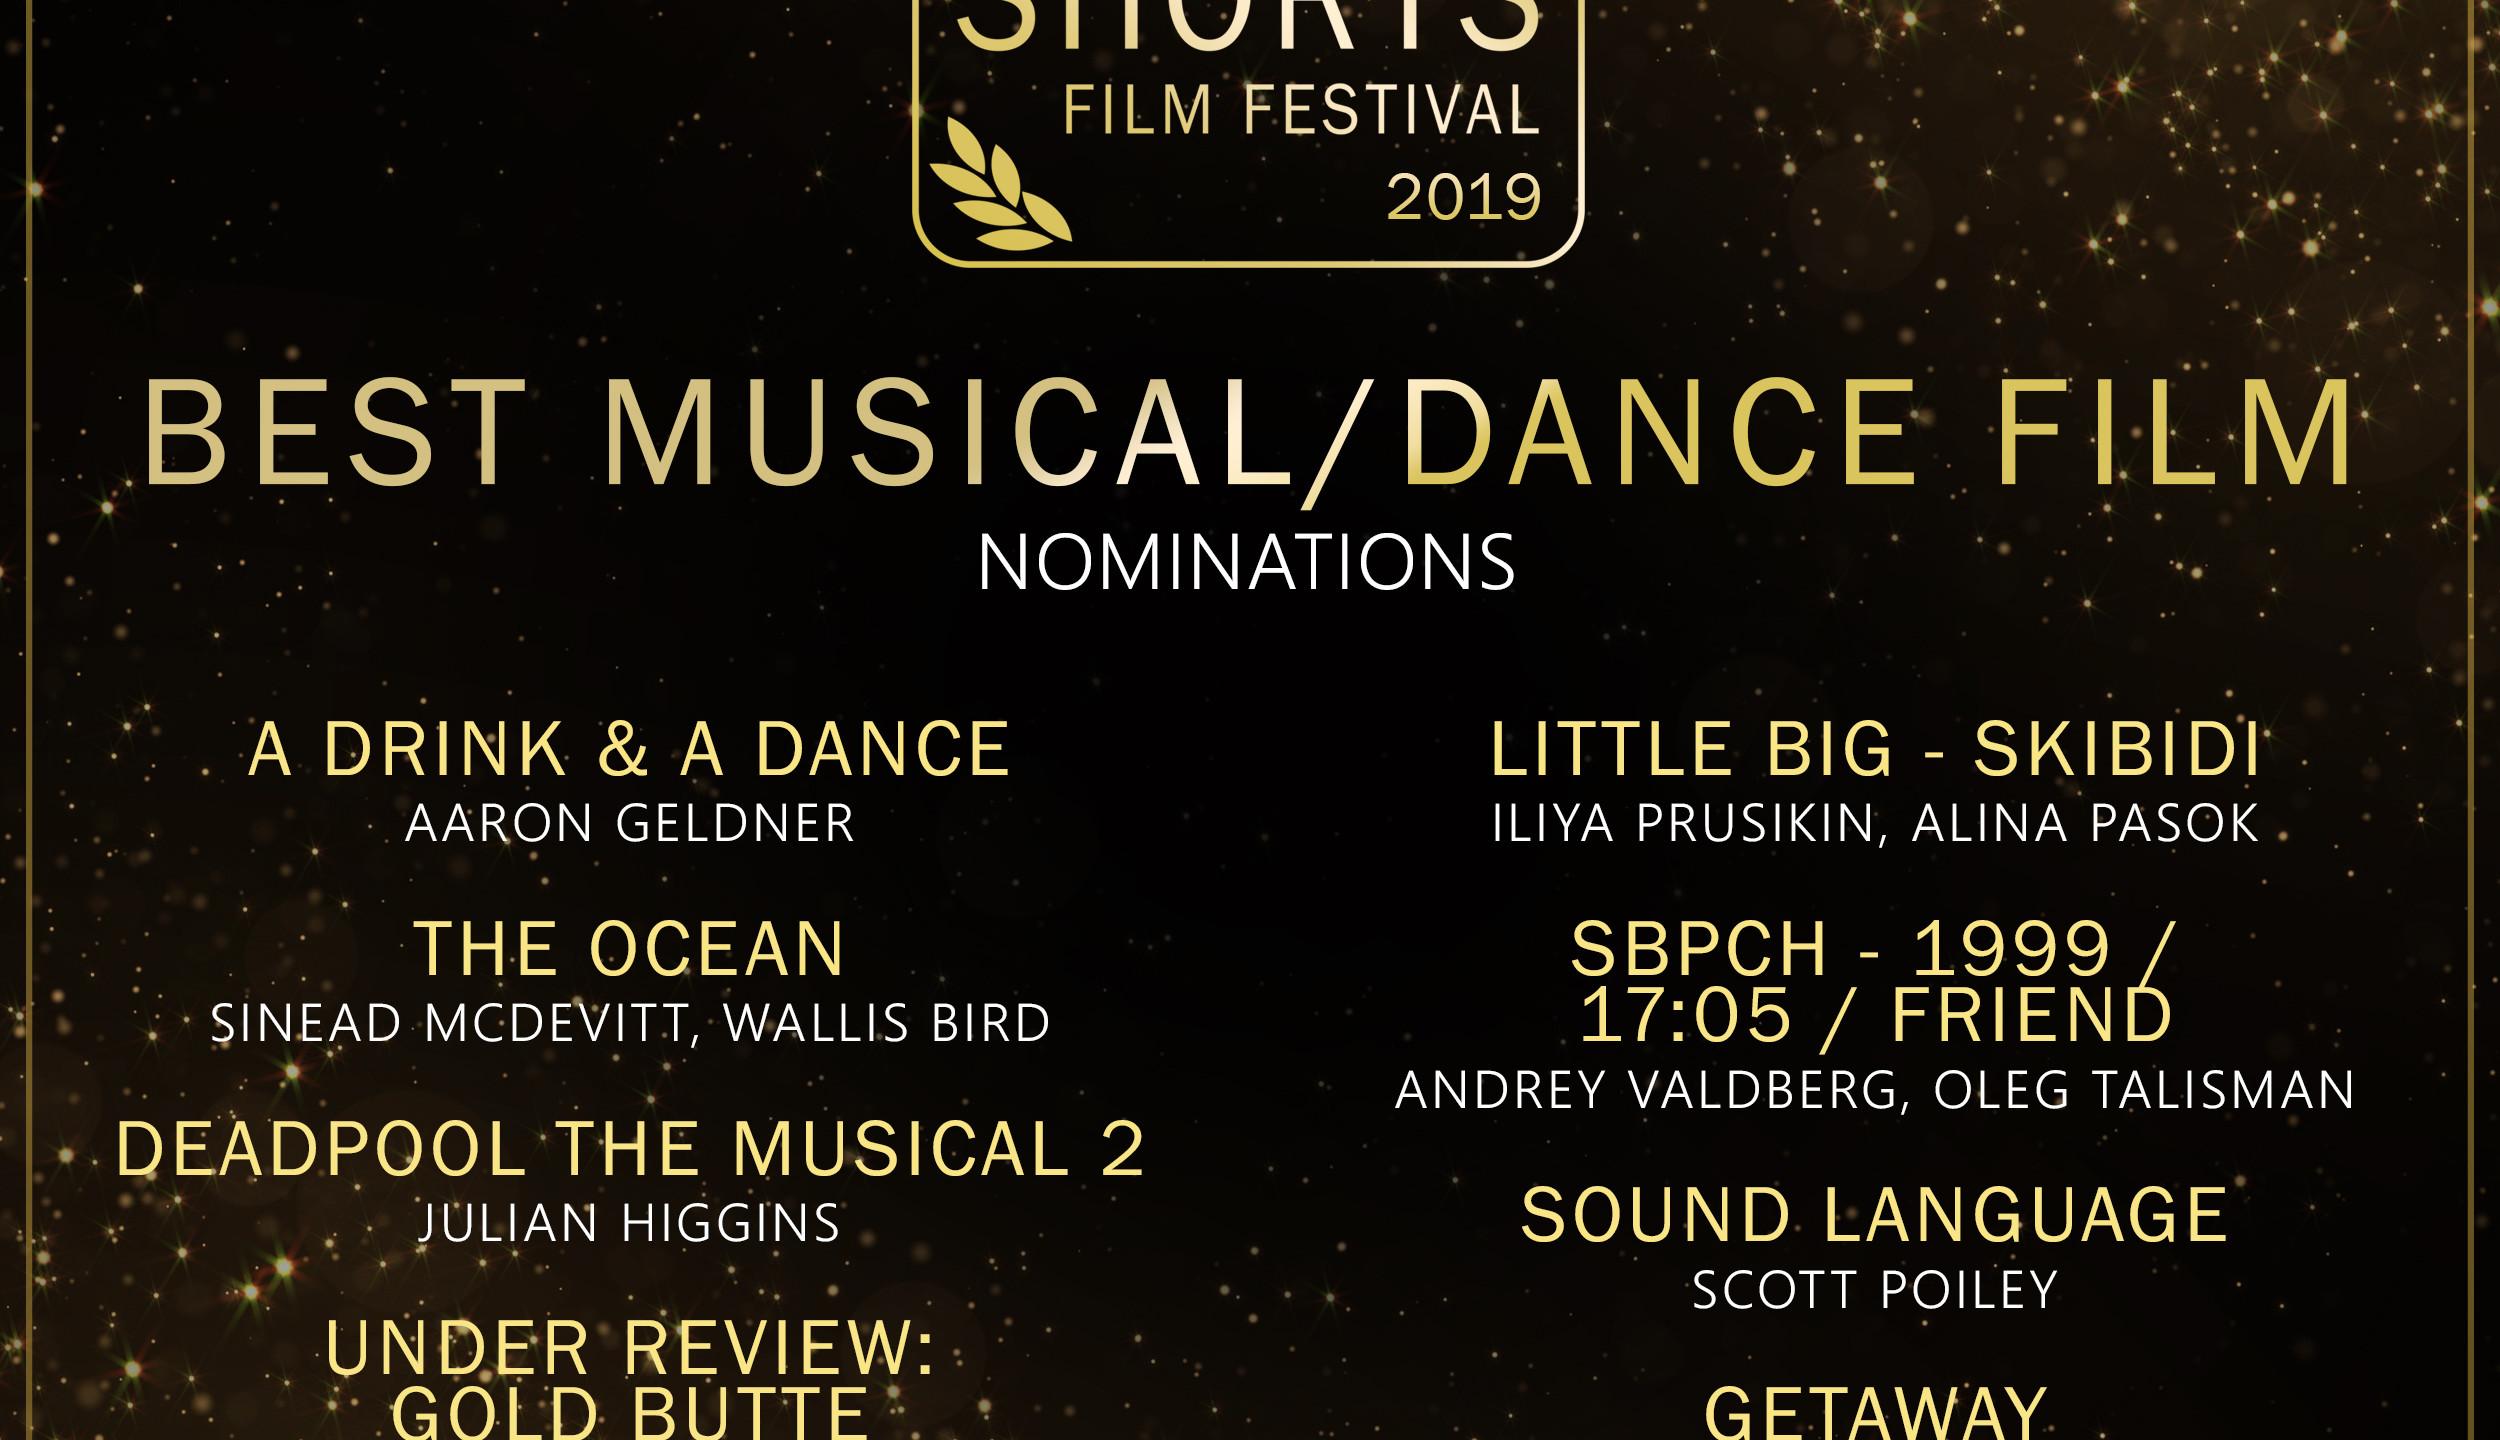 Musical-Dance Film